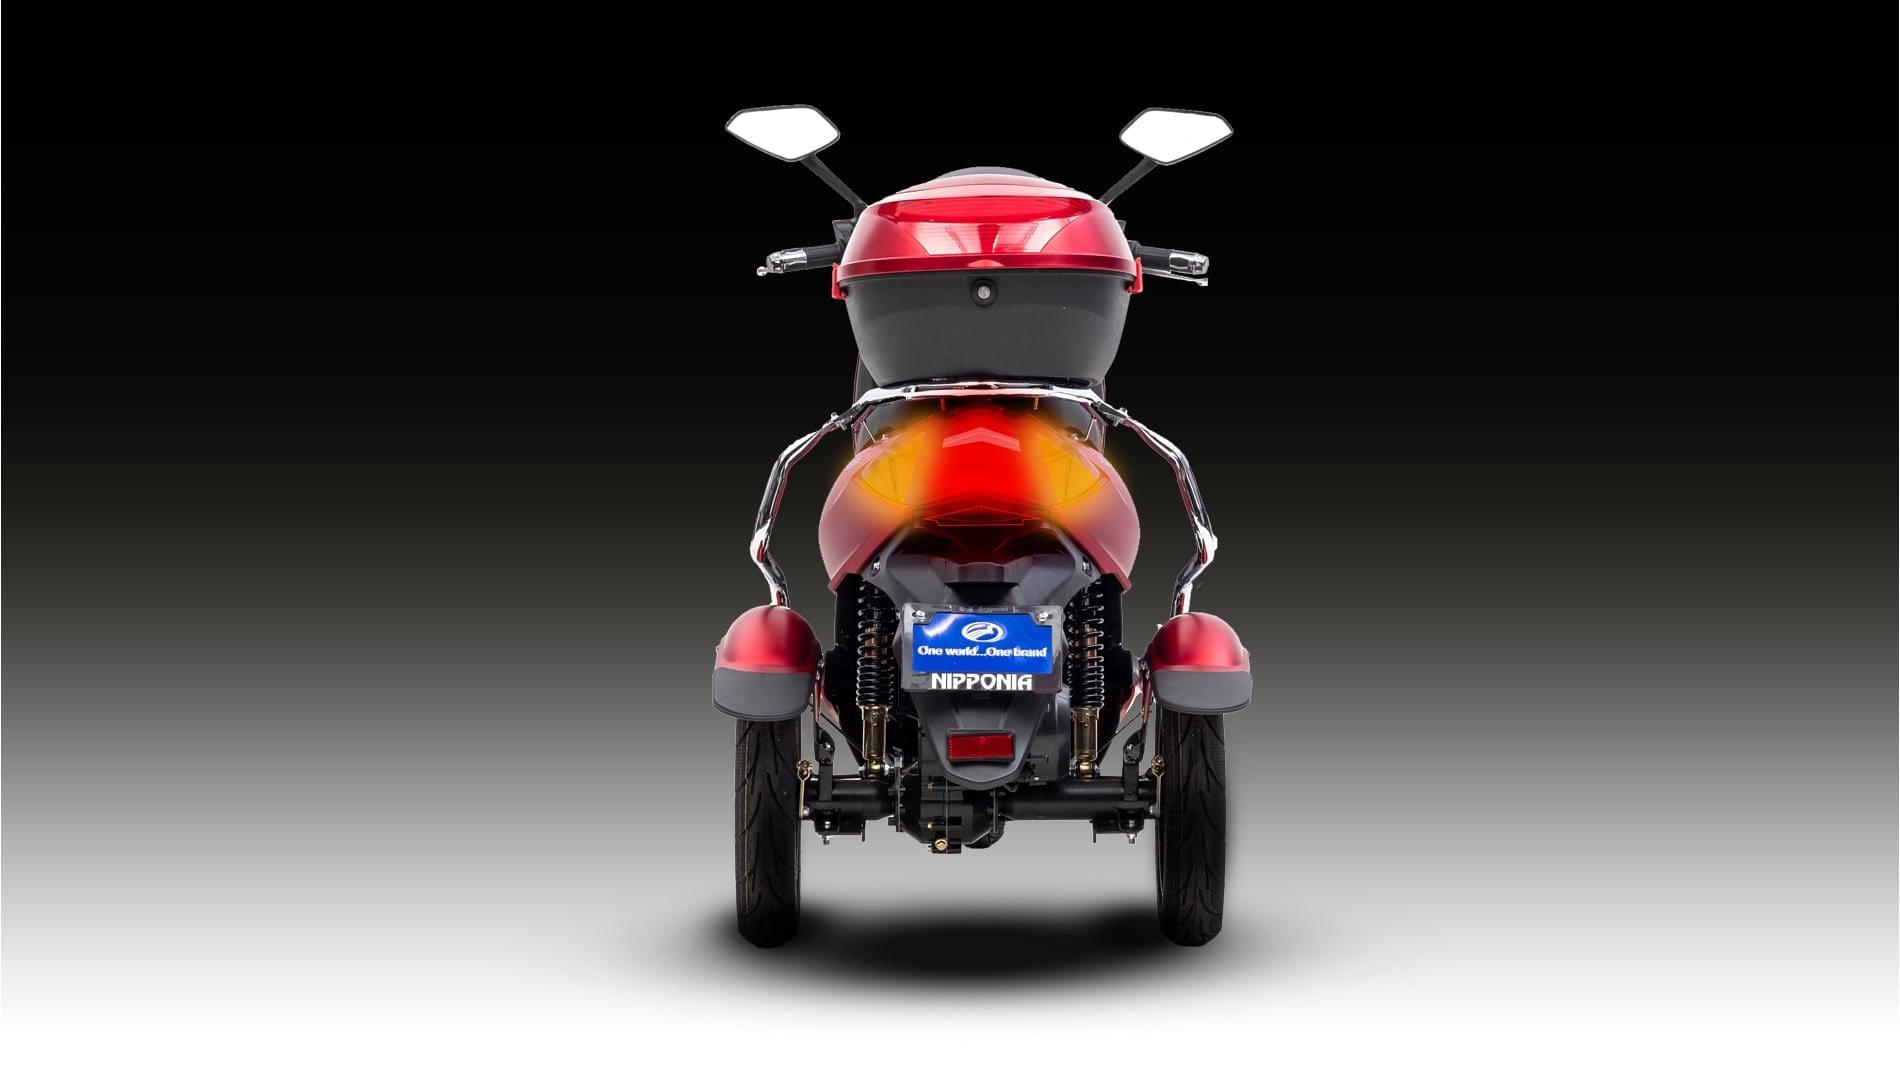 Nipponia Driewielscooter Pride Rear